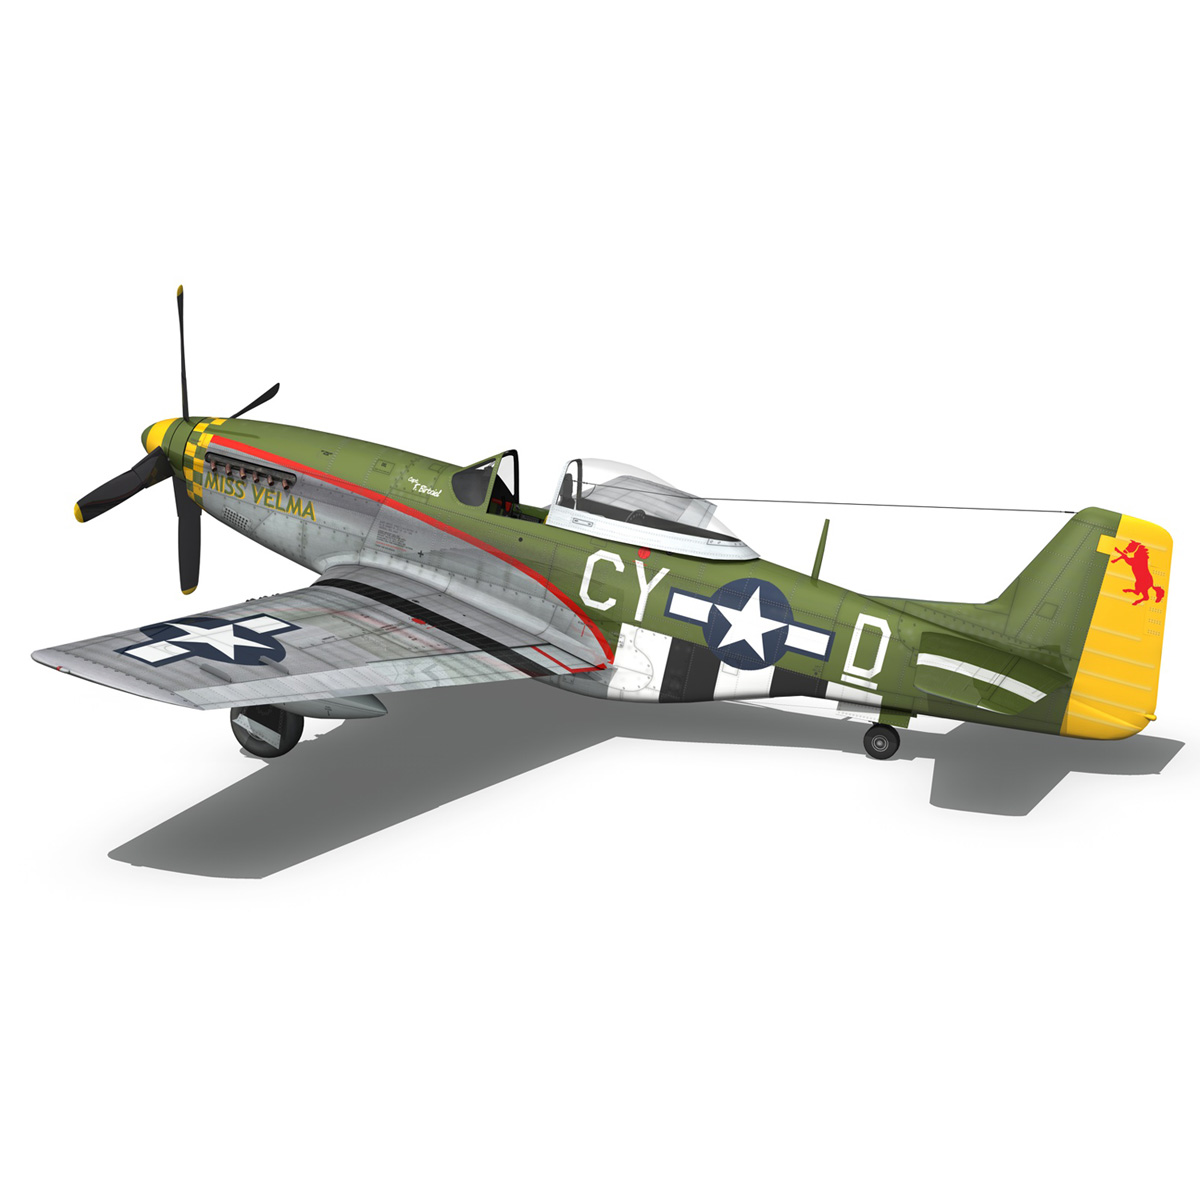 north american p-51d – mustang – miss velma 3d model 3ds fbx c4d lwo obj 267628